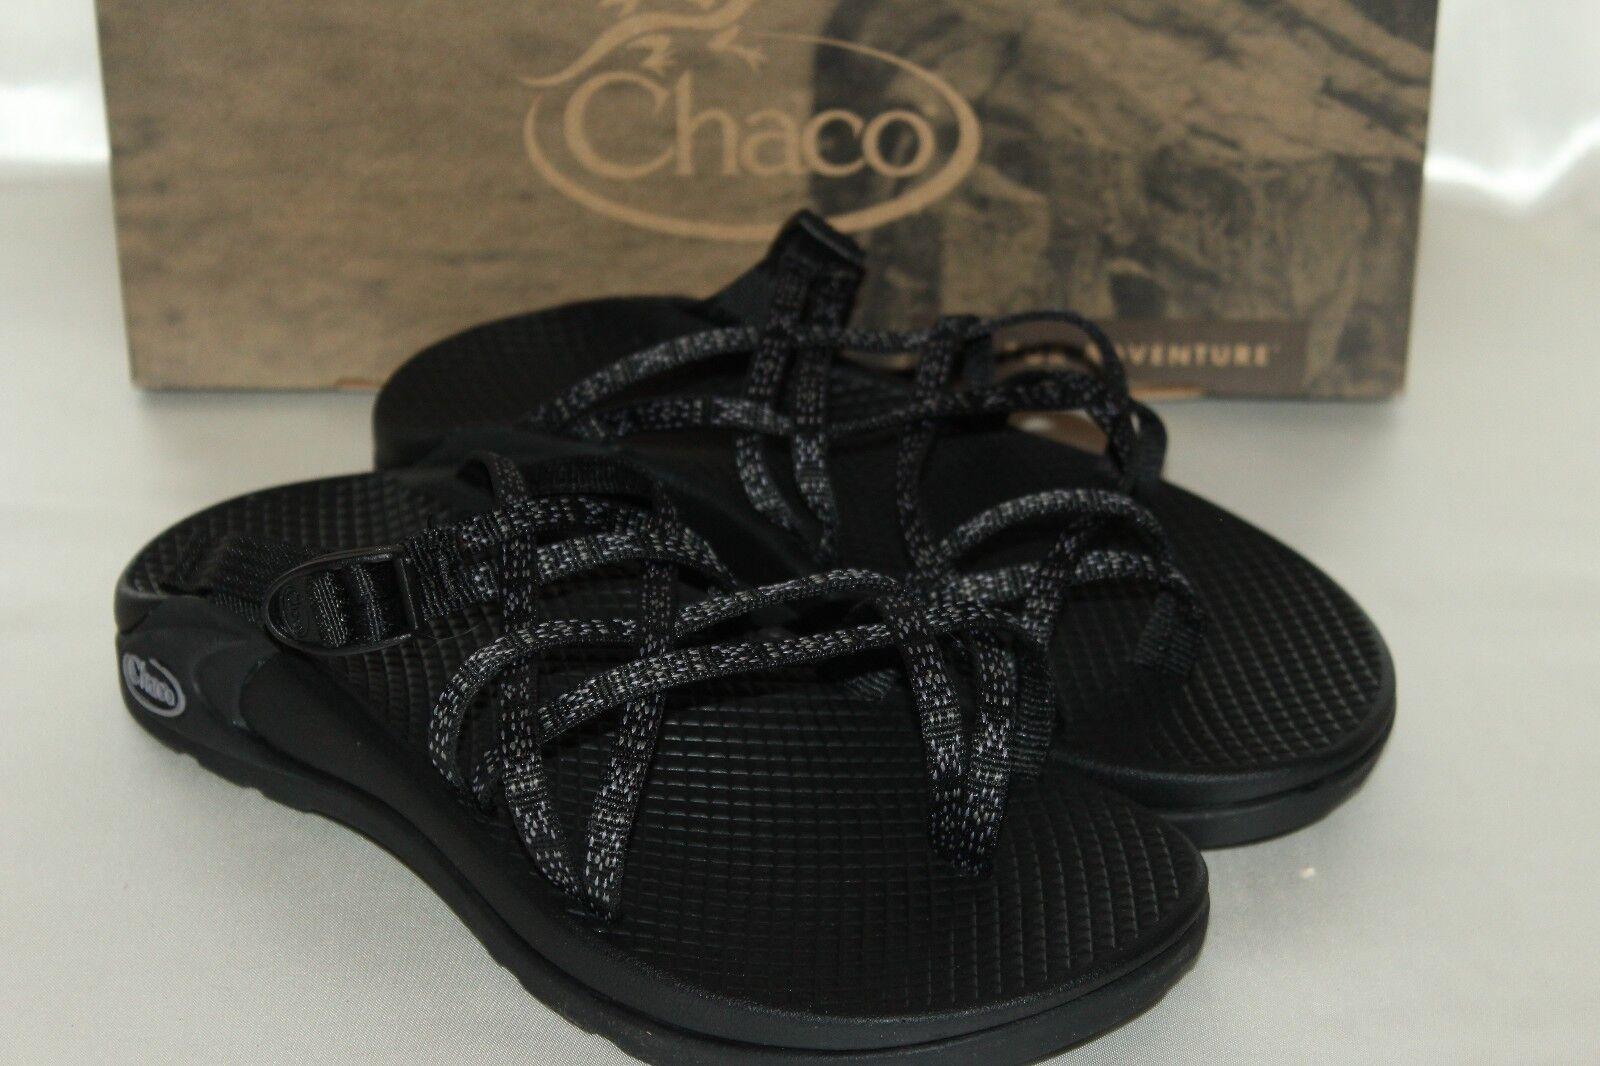 NEW CHACO VIBRAM Black Nylon ZONG X Ecotread Sport Athletic Toe Loop Sandal Sz 5